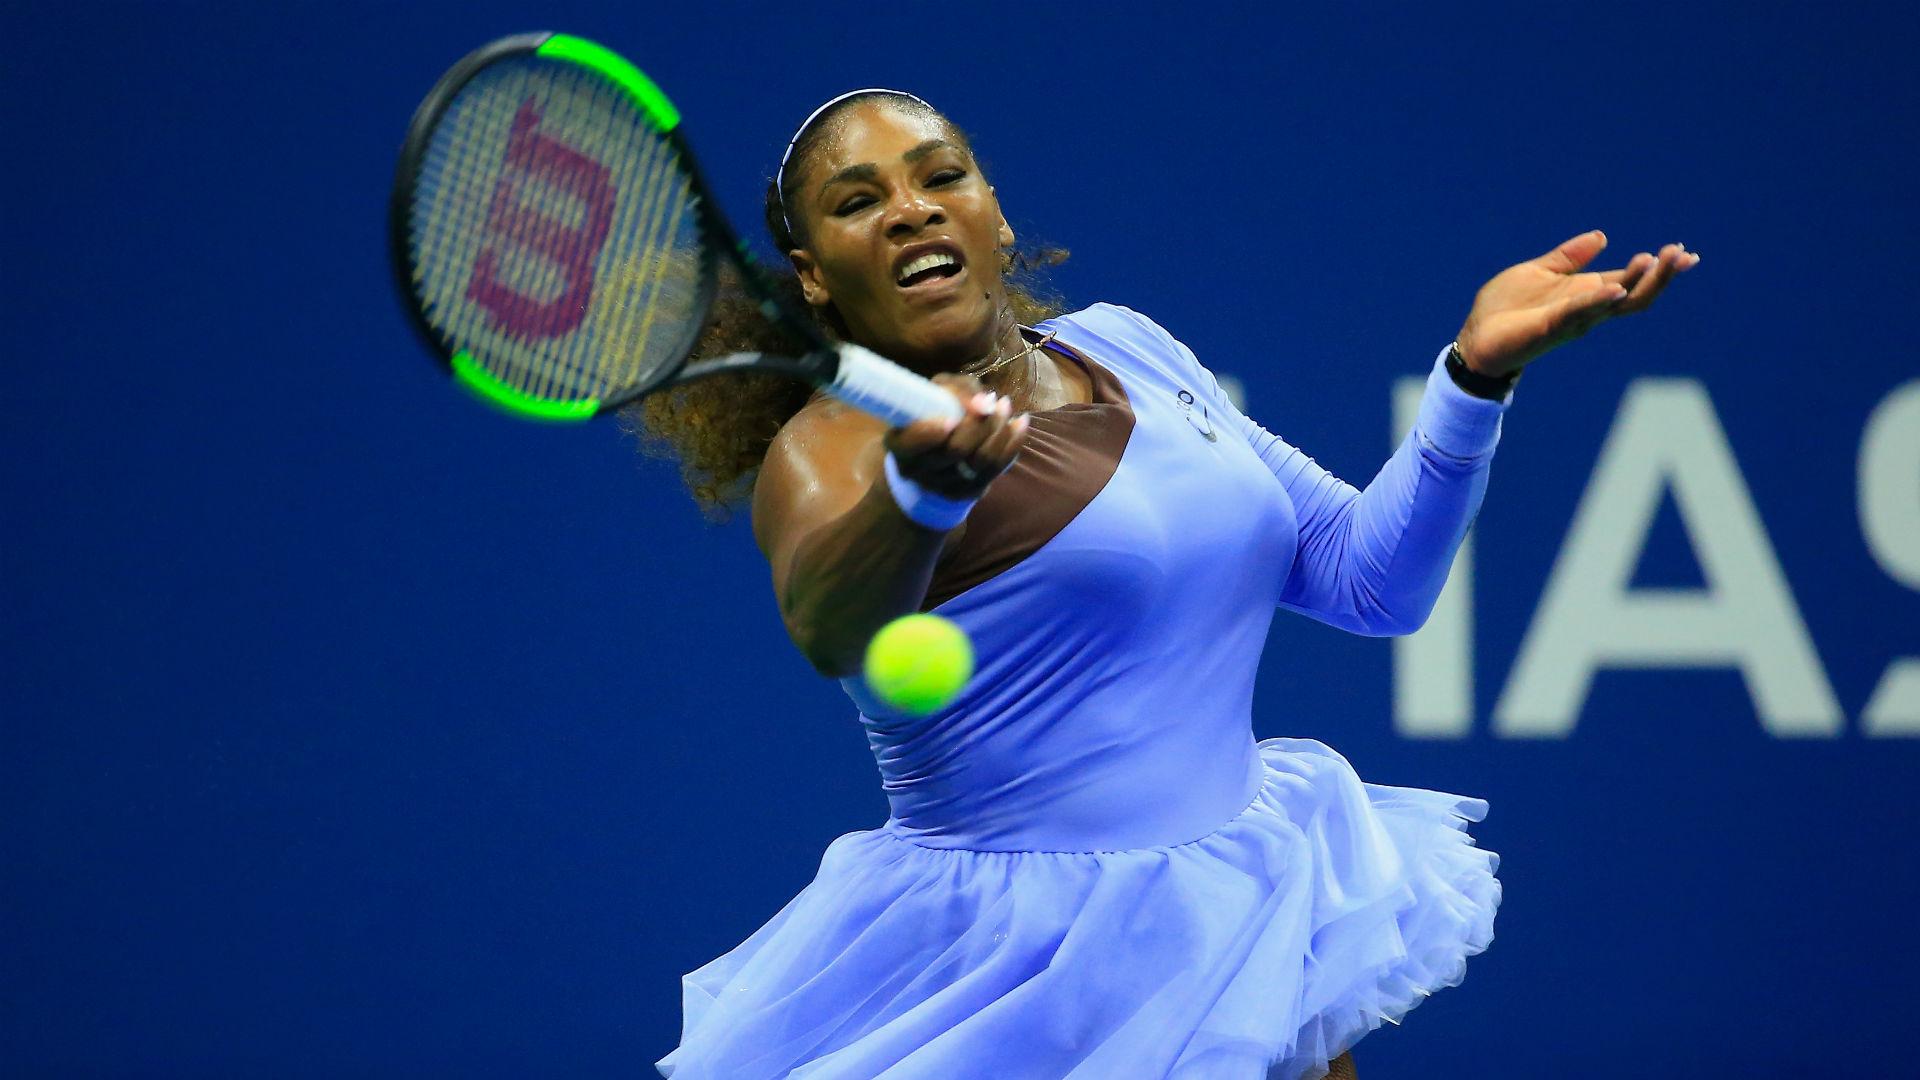 Serena Williams Confirmed For Hopman Cup Tennis News Stadium Astro